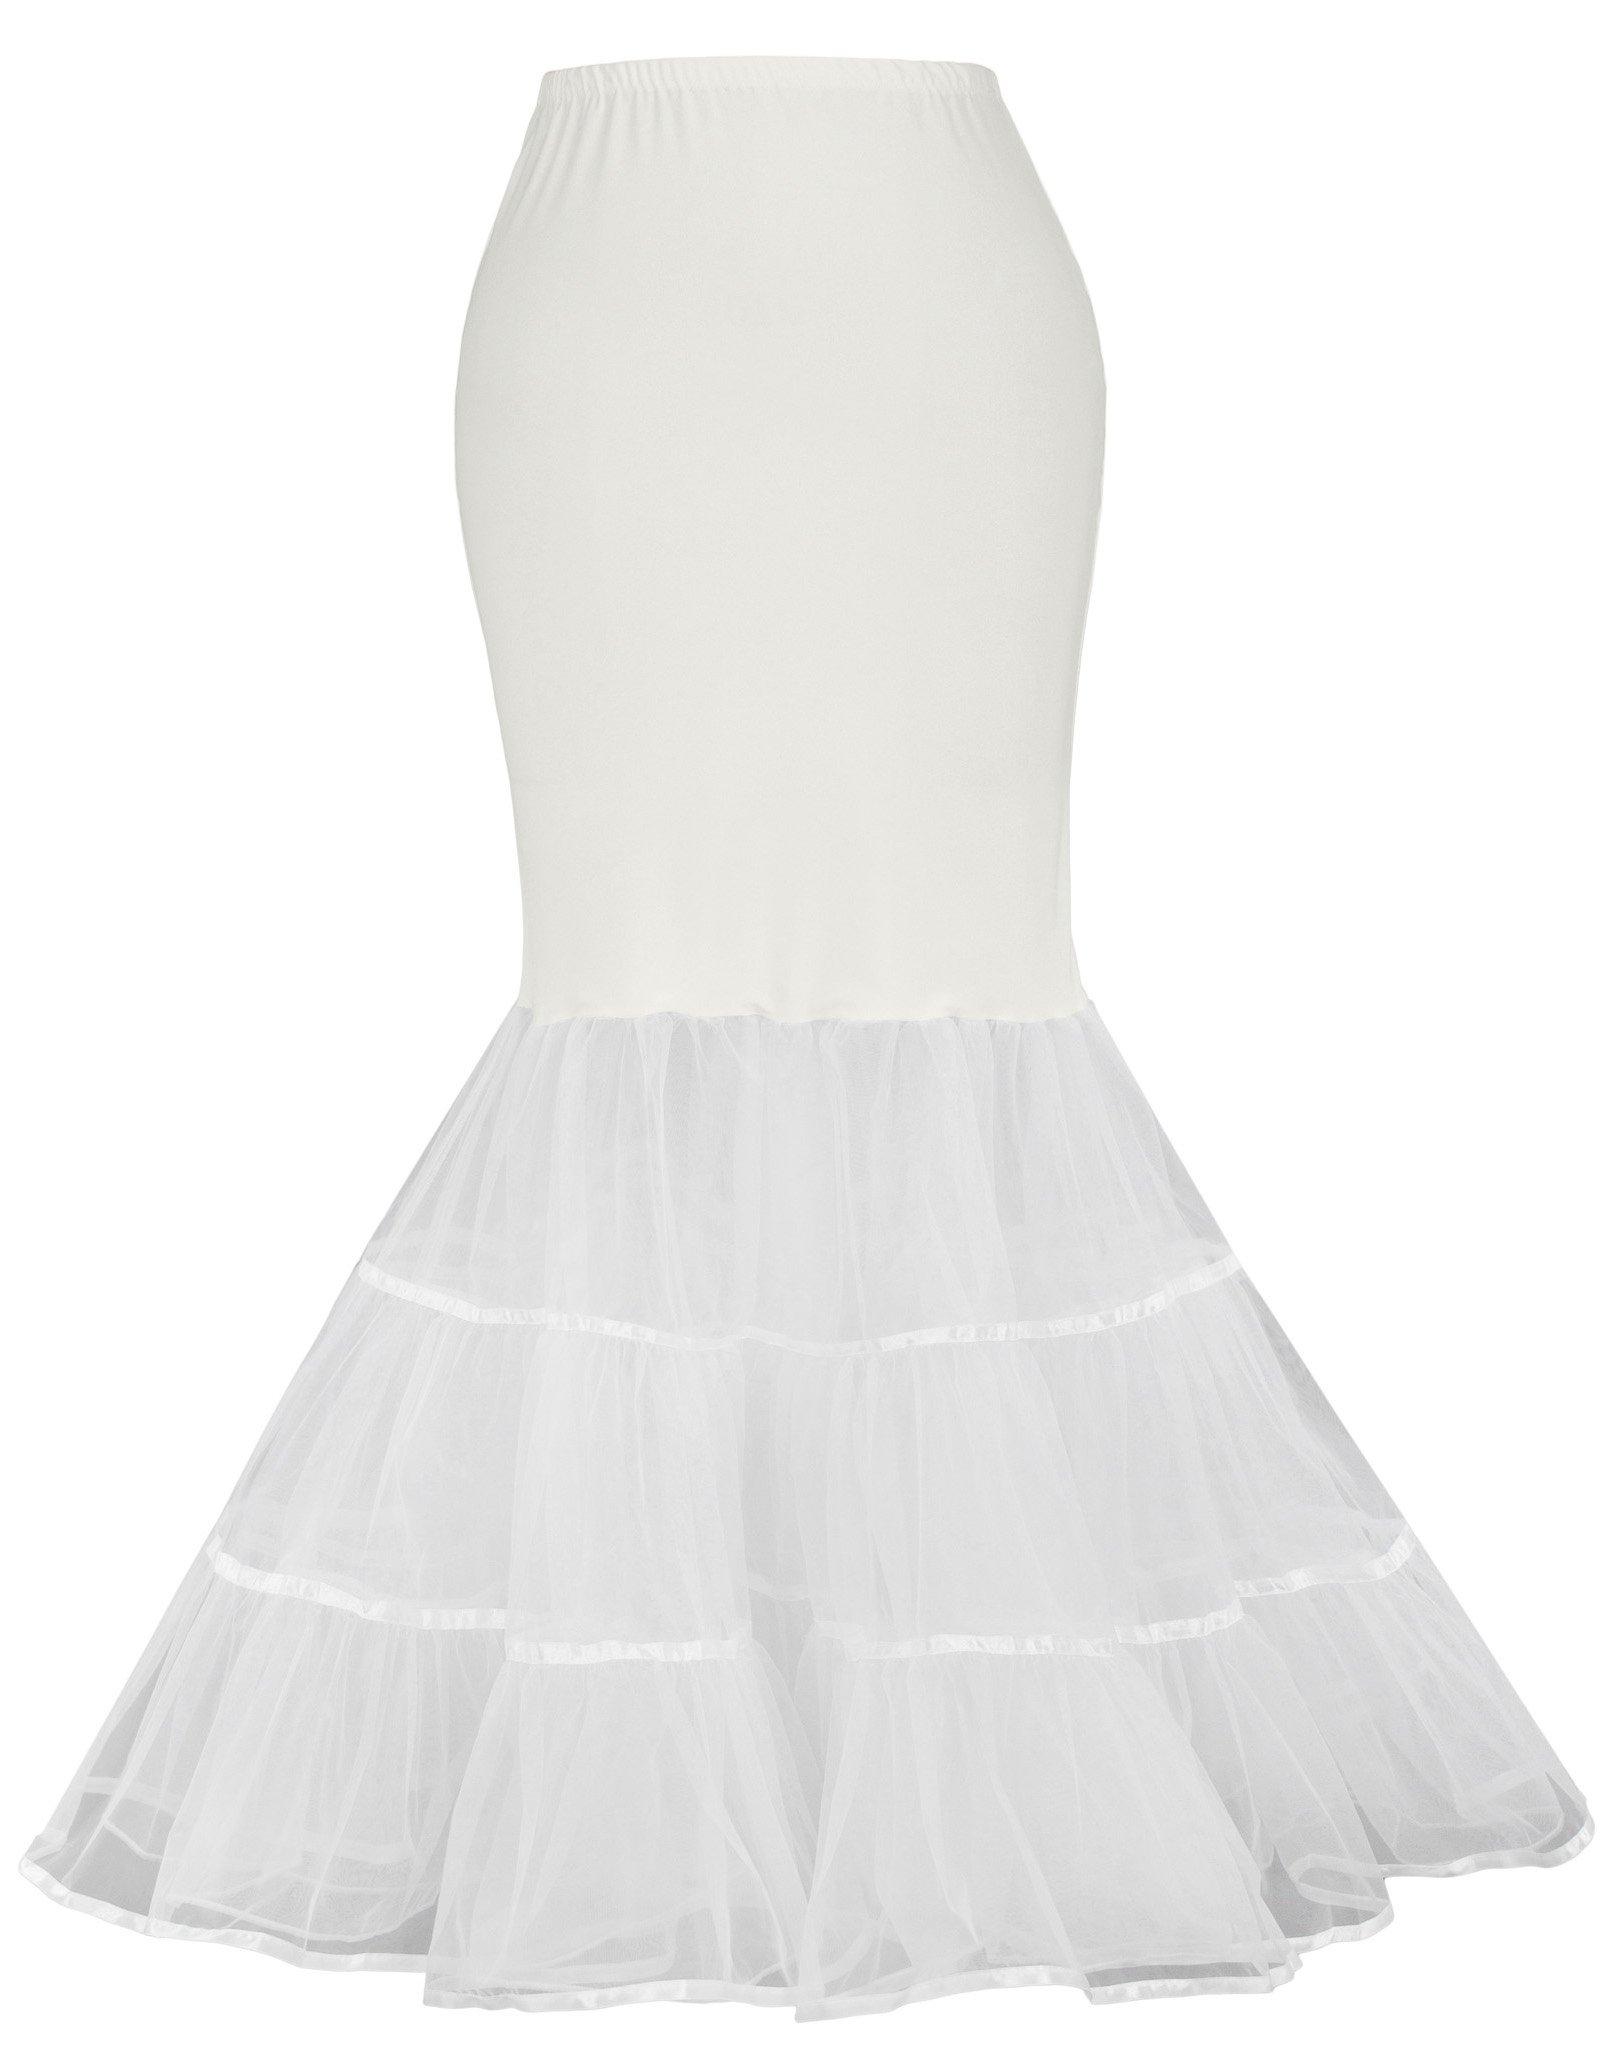 GRACE KARIN 2 Layers Long Victorian Bridal Underskirt Crinoline for Woman(L,Ivory 477)